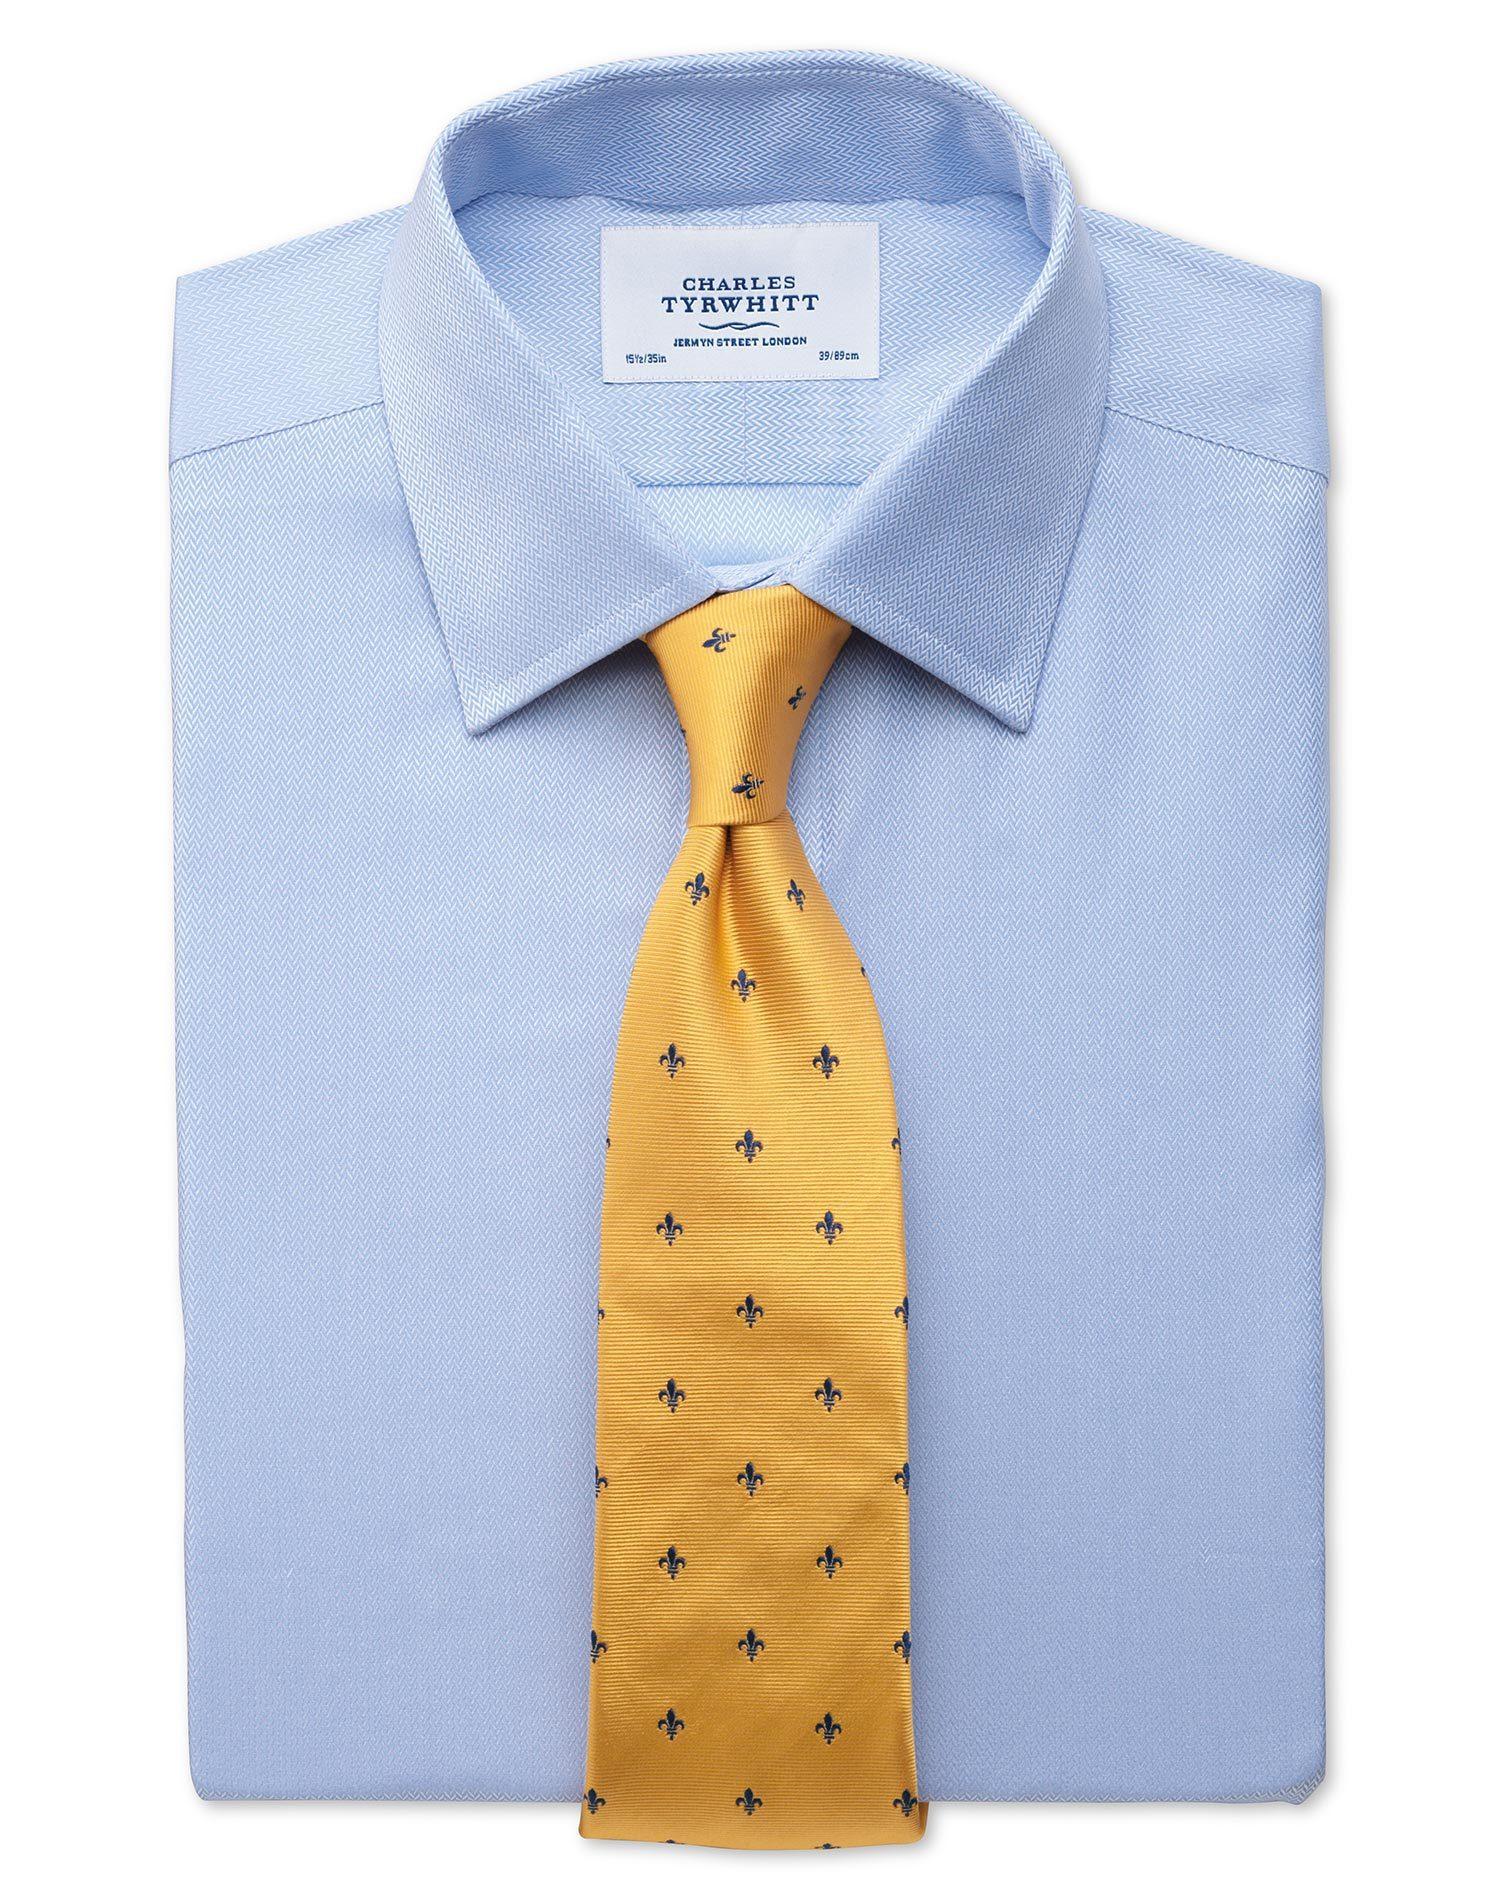 Slim Fit Small Herringbone Sky Cotton Formal Shirt Single Cuff Size 16.5/35 by Charles Tyrwhitt